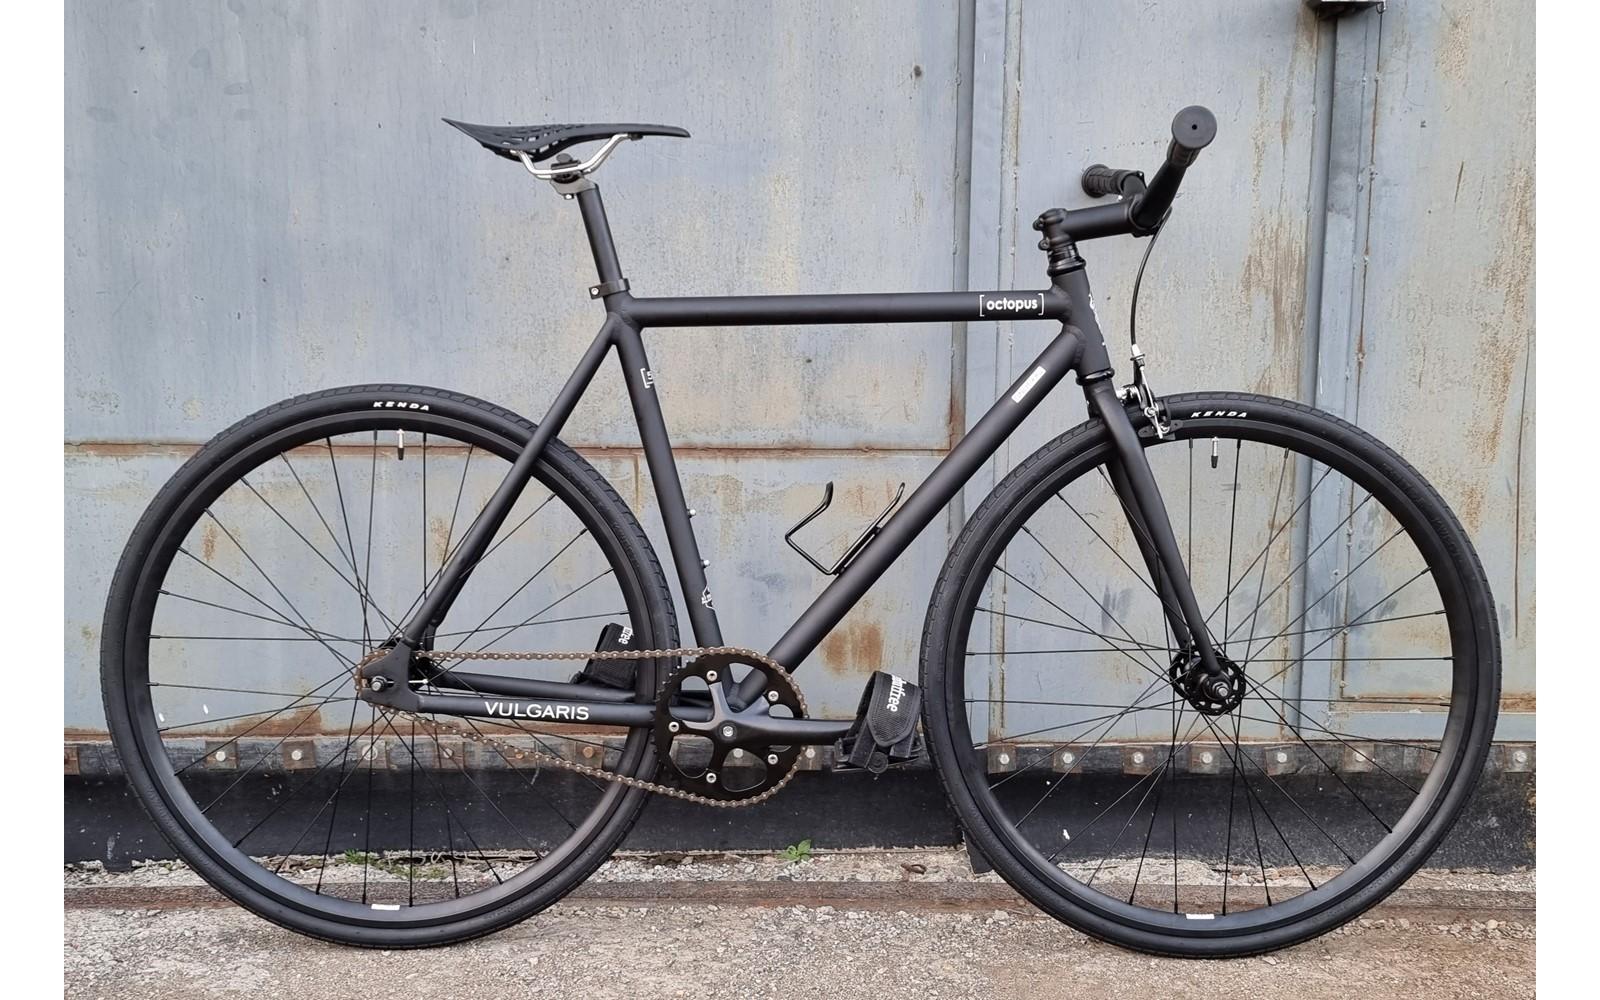 Велосипед Octopus Vulgaris Street за 10499900 руб.